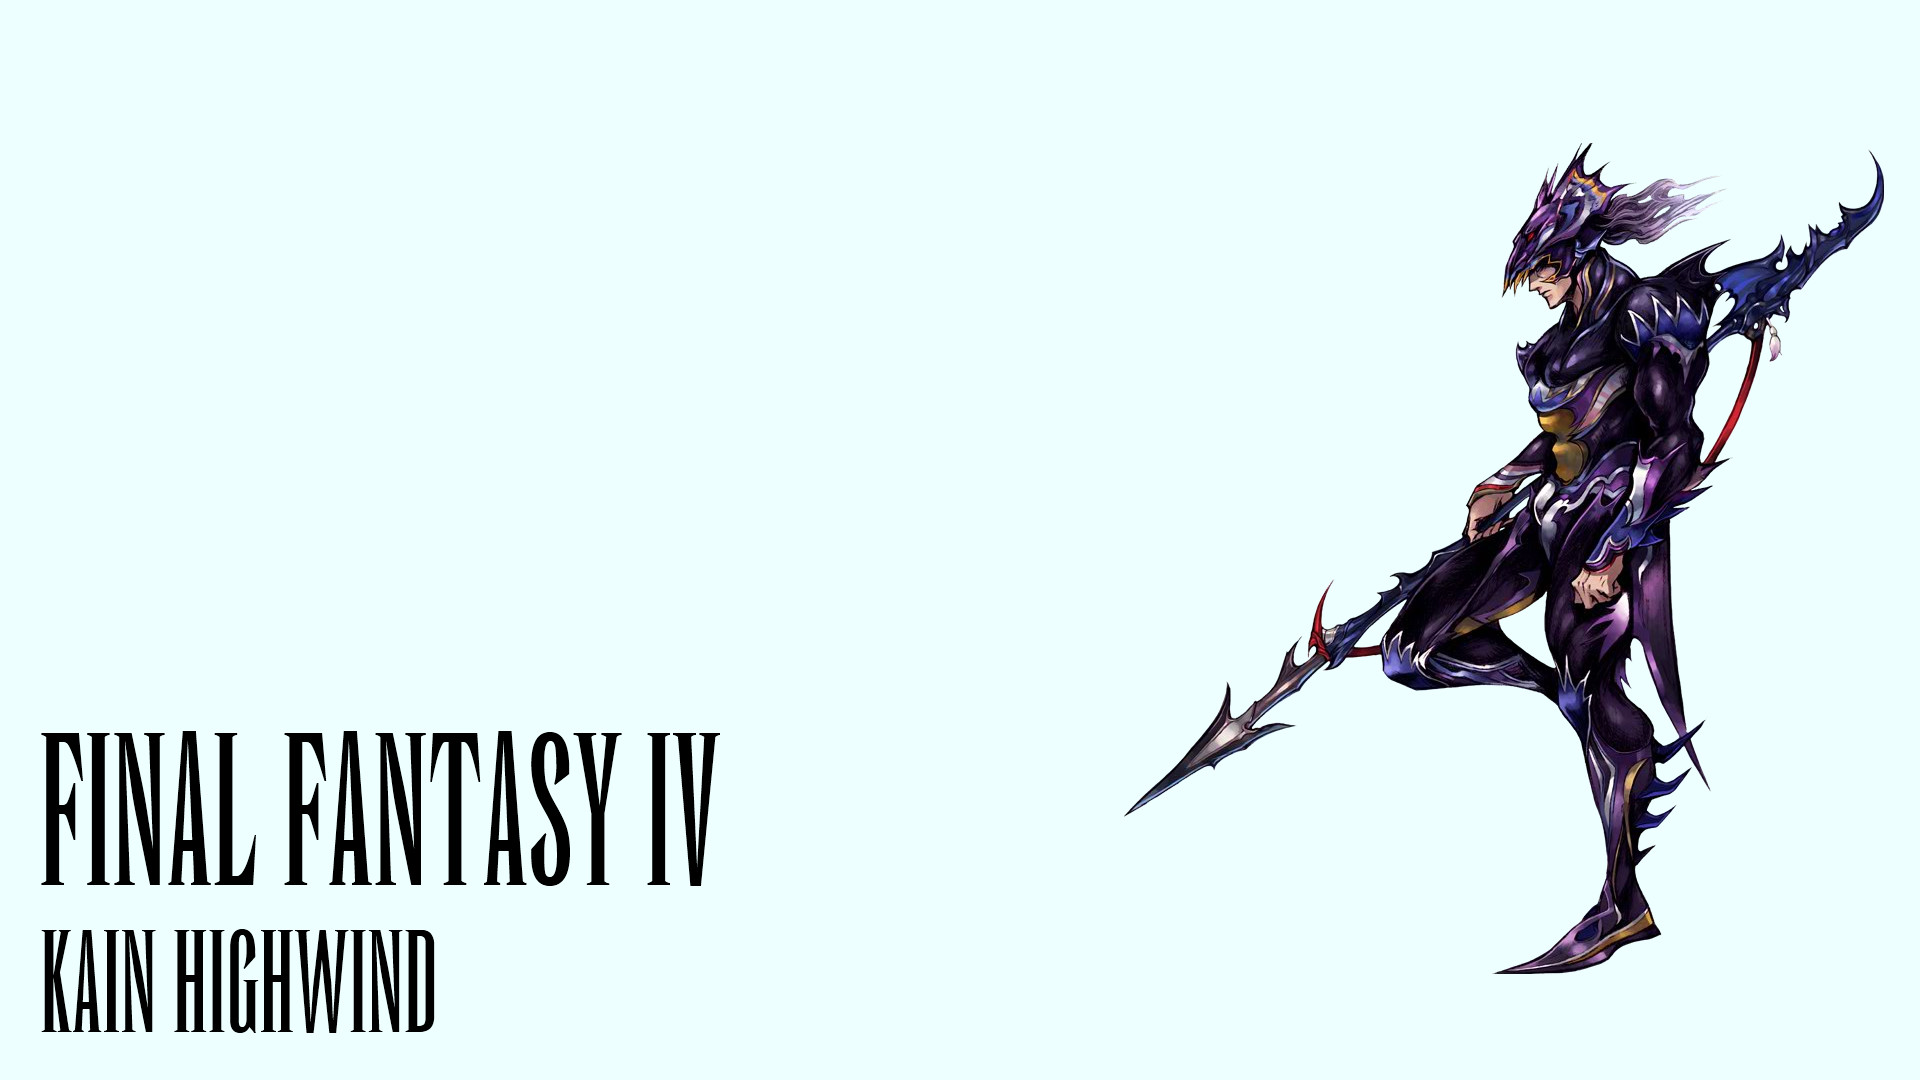 Video Game – Final Fantasy IV Kain Highwind Final Fantasy Wallpaper